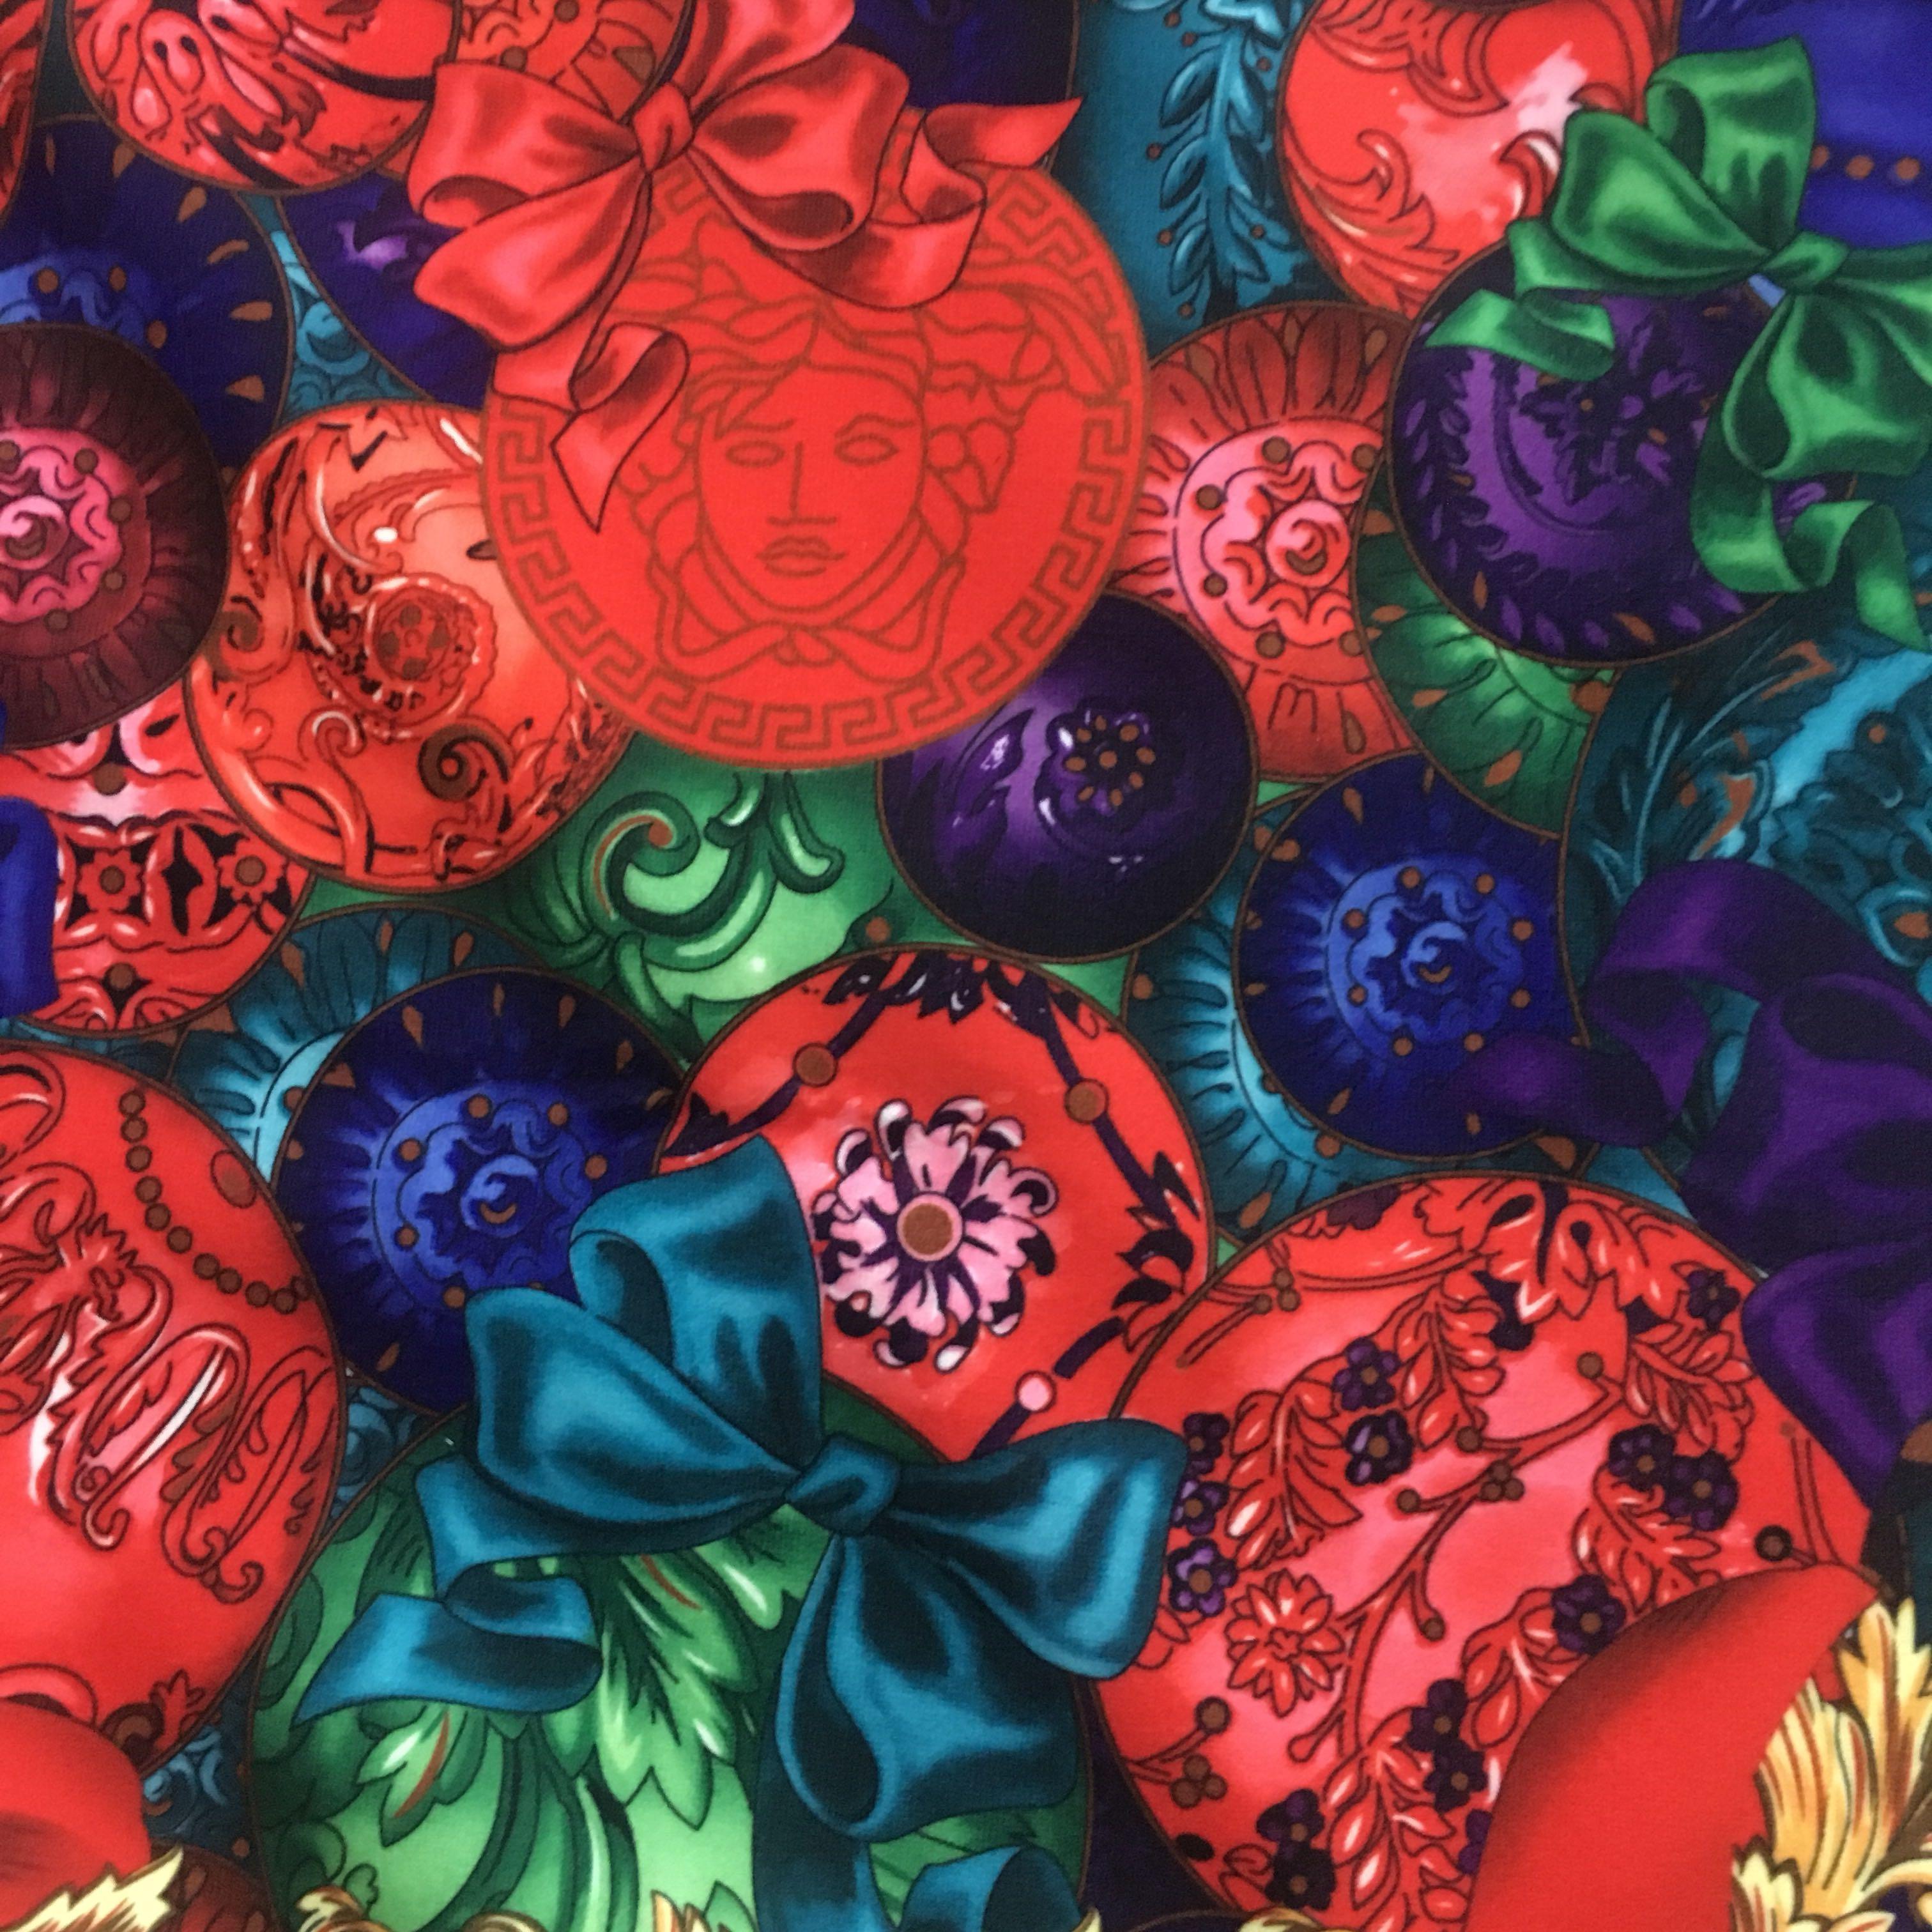 Luxury Italian Medusa Art  Decorative Pillows  Cases